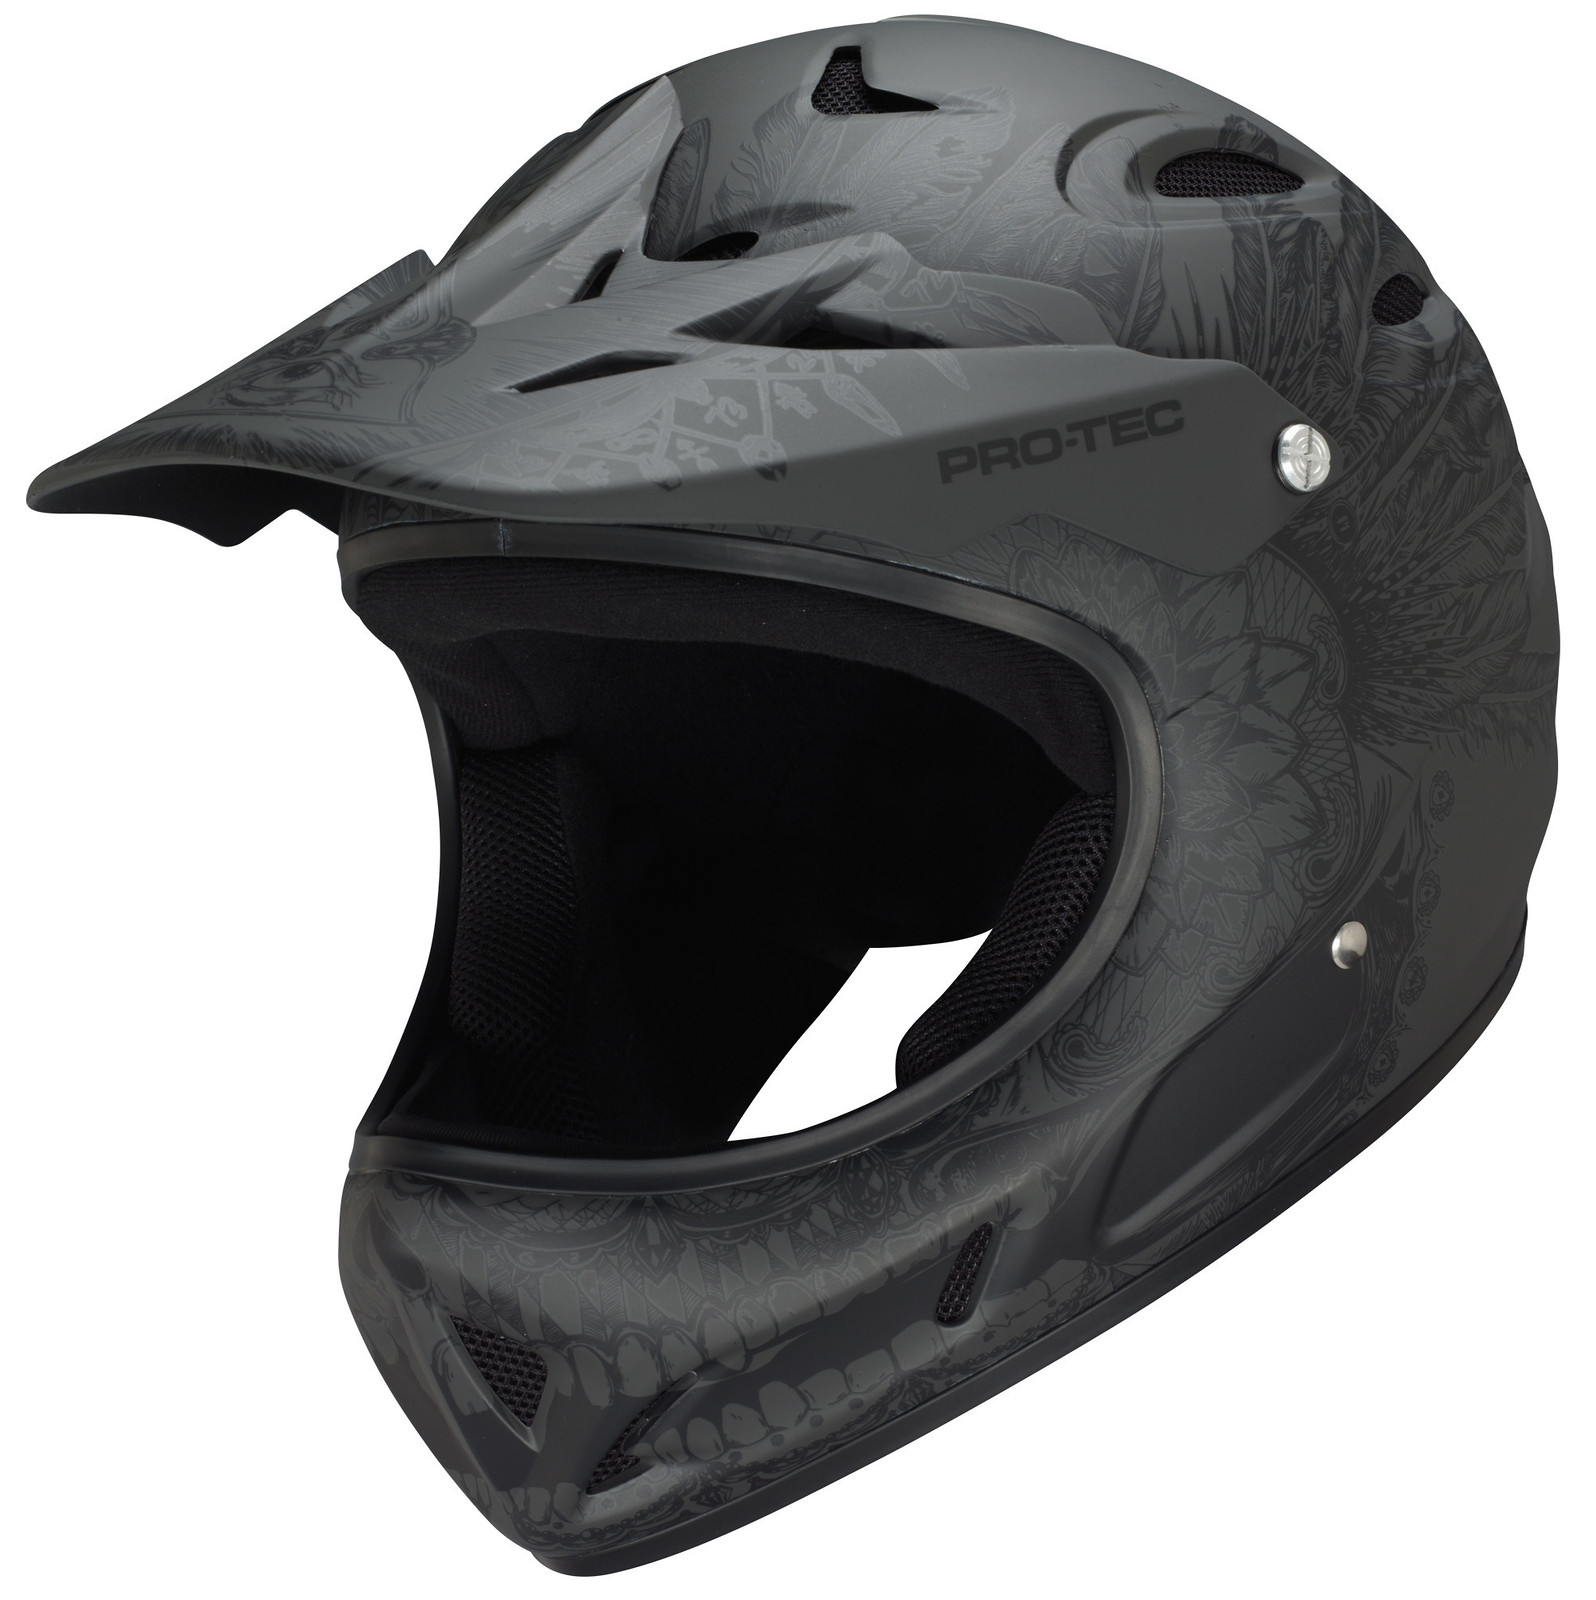 Pro-Tec Shovelhead 2 Full Face Helmet shovelhead-blackfeatherskull-sp14